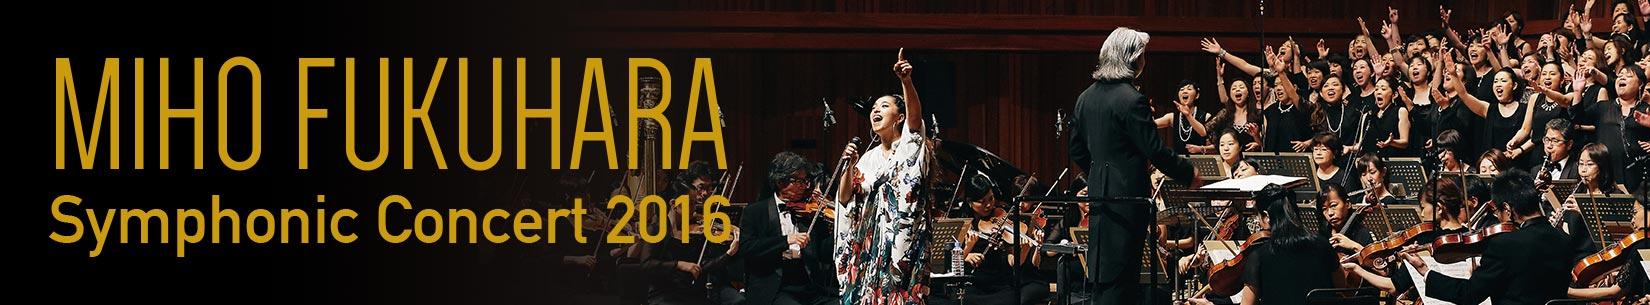 New Release MIHO FUKUHARA Symphonic Concert 2016